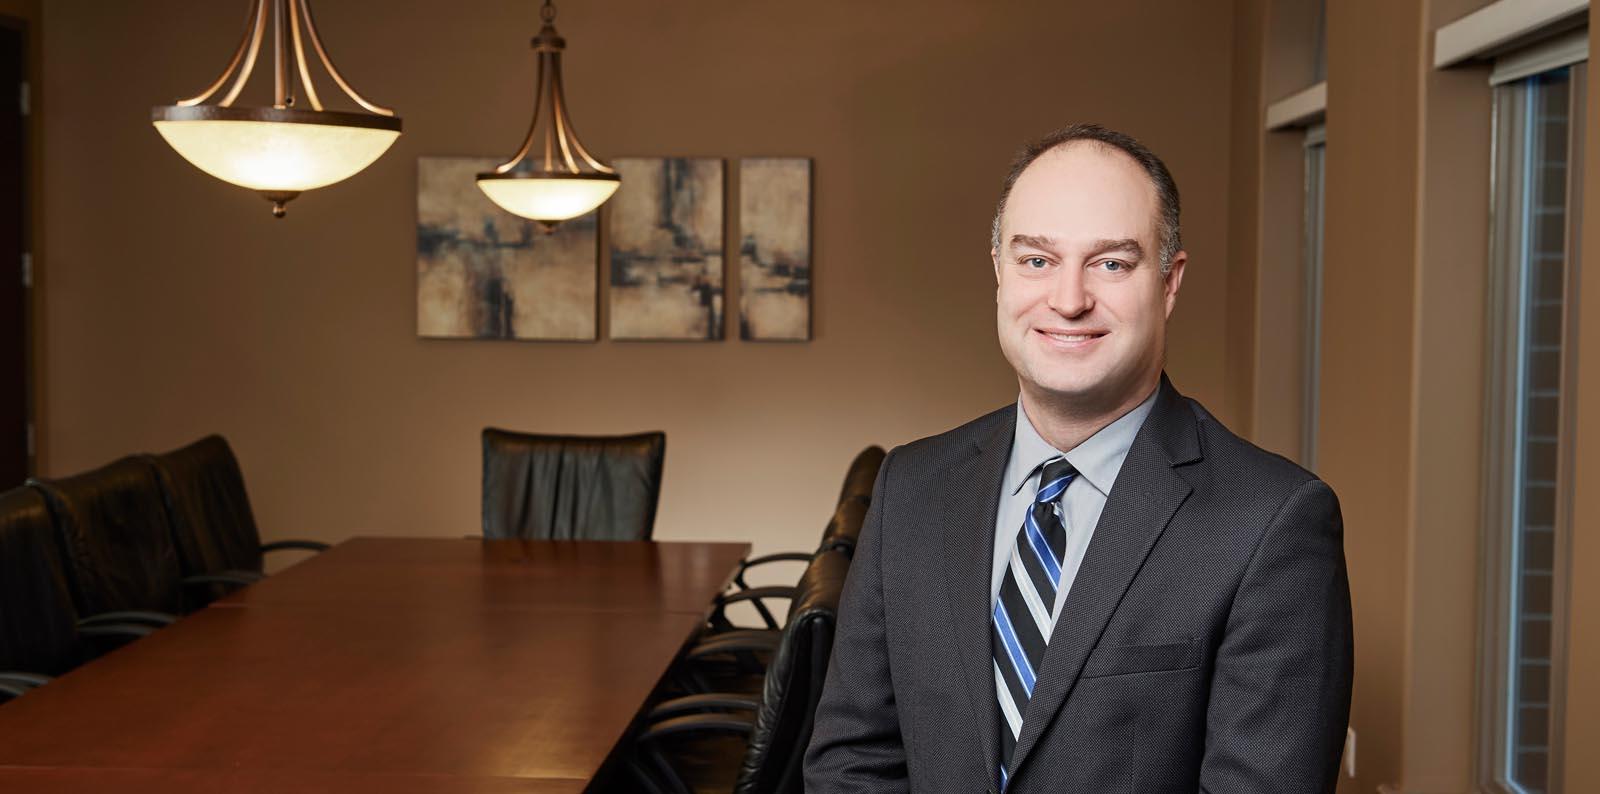 Scott_Klein_Millards Chartered Professional Accountants